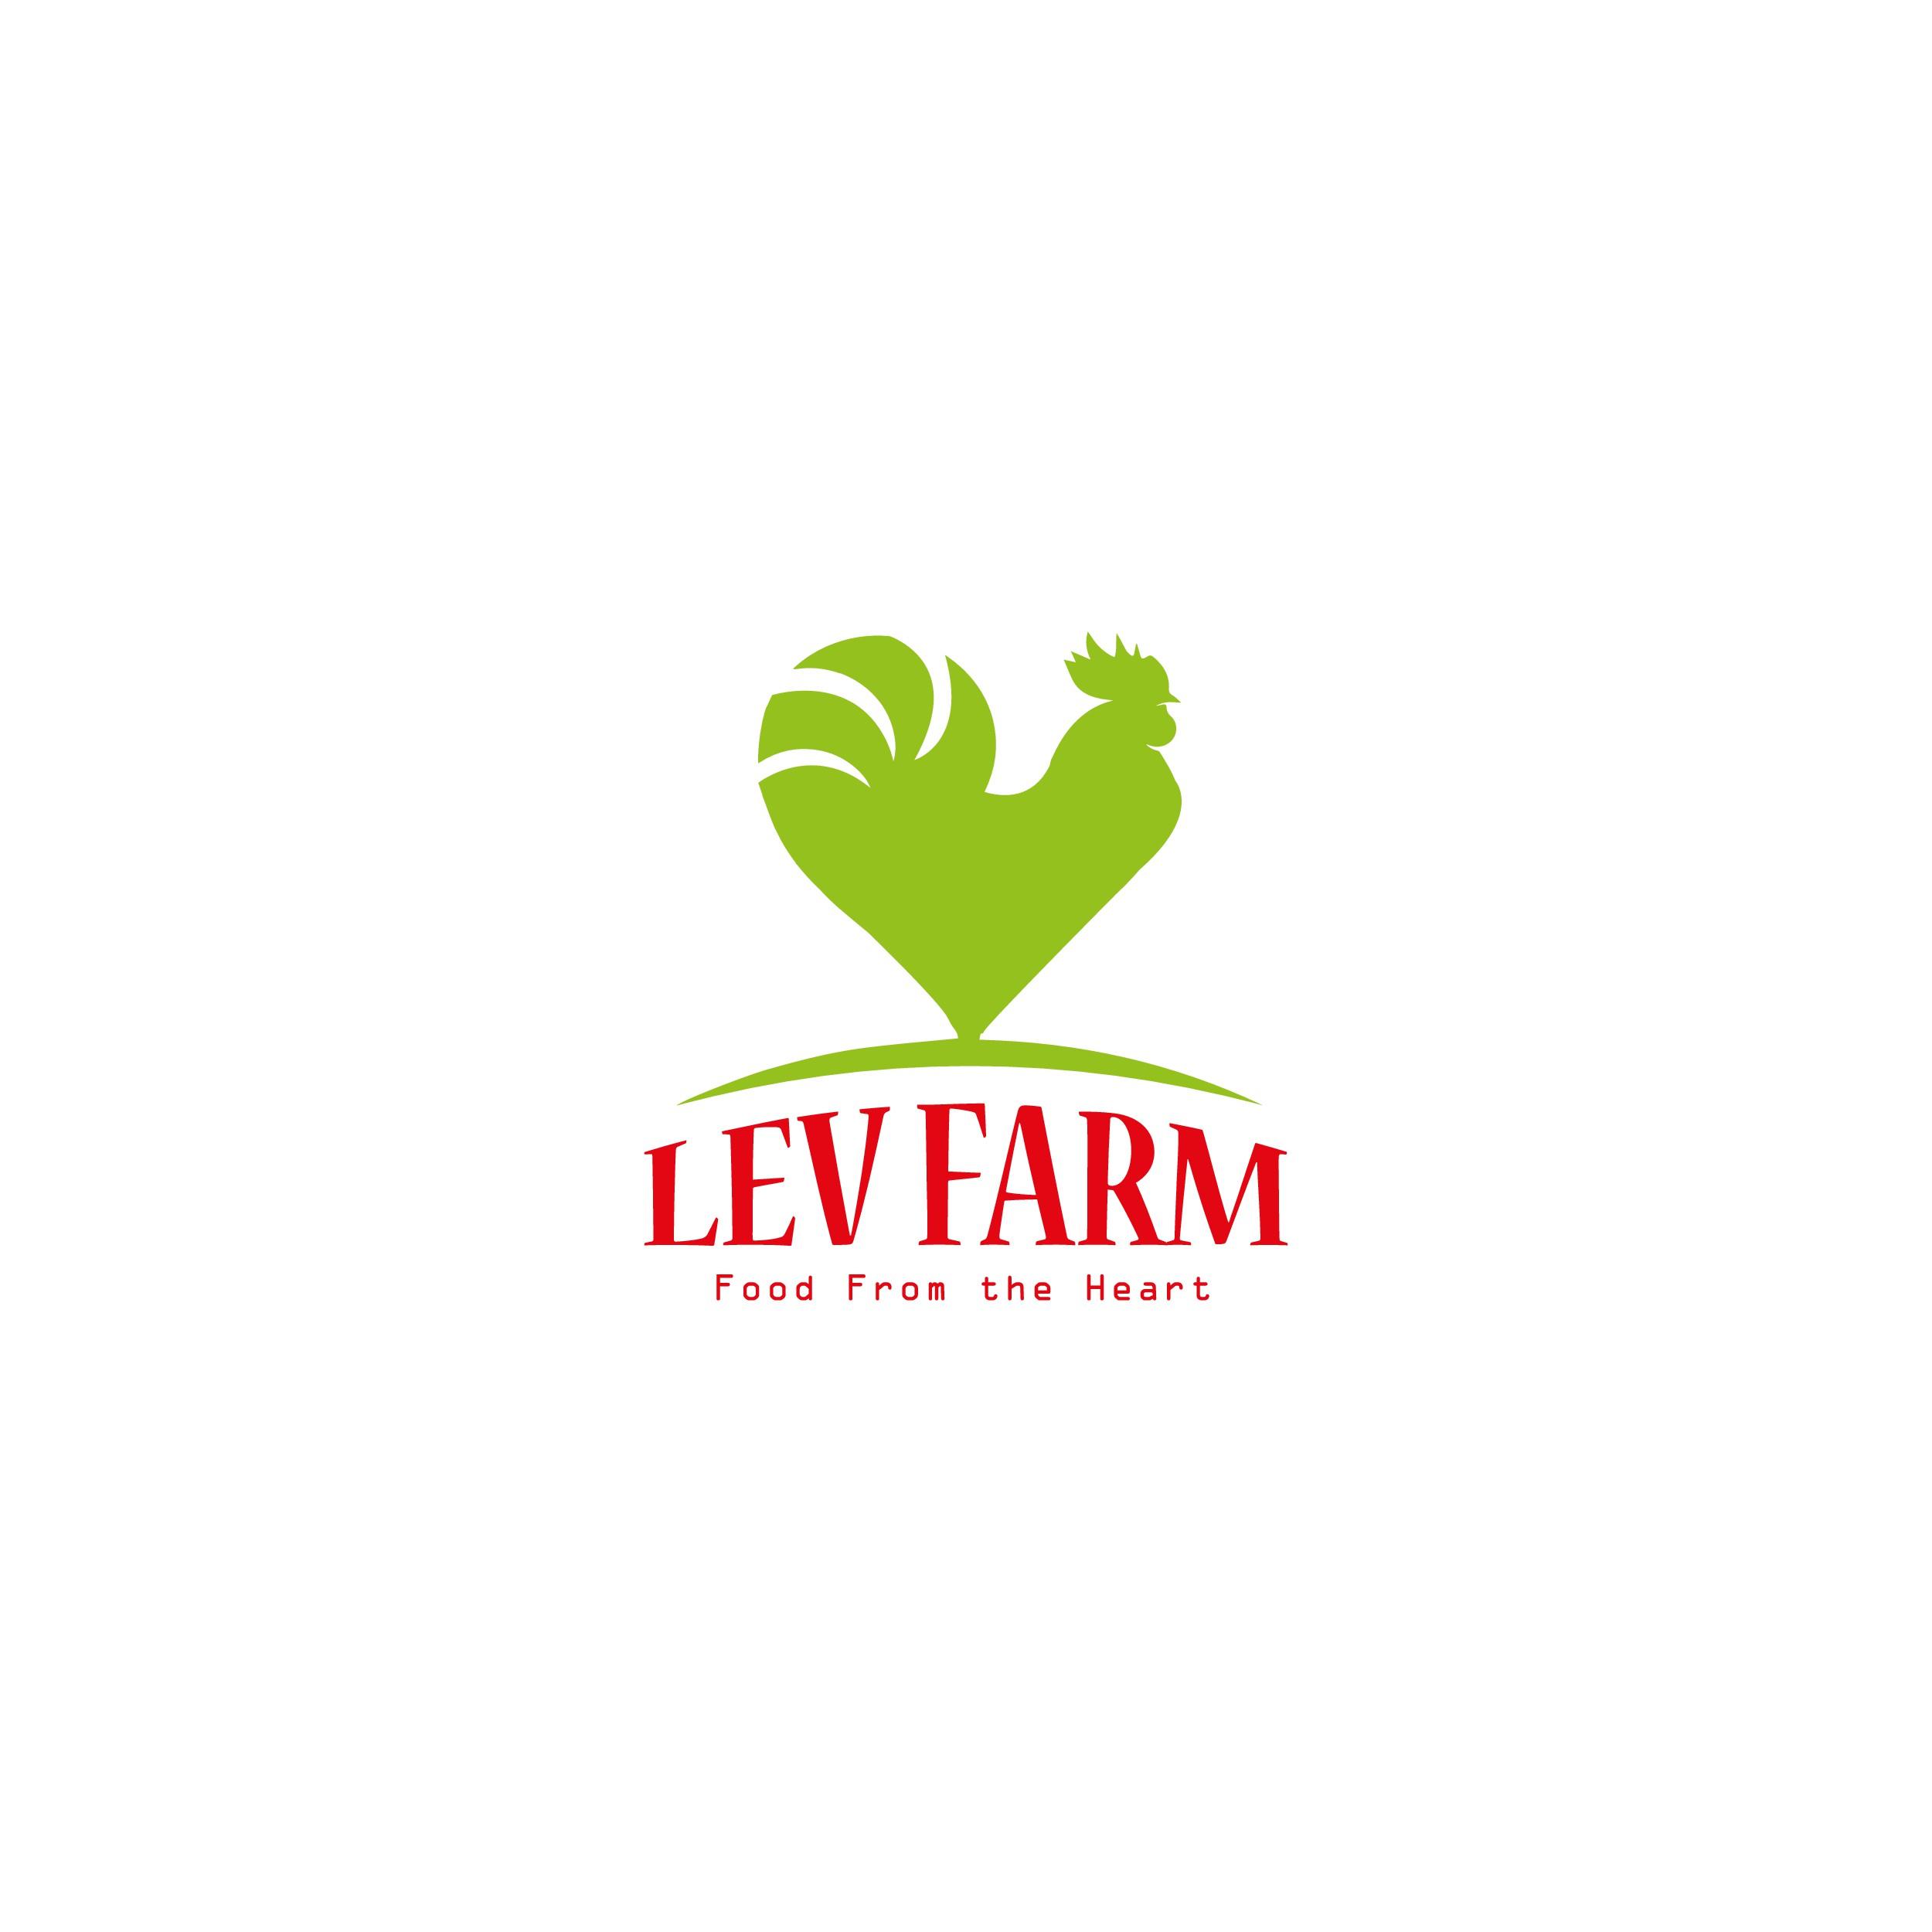 Lev Farm Contest